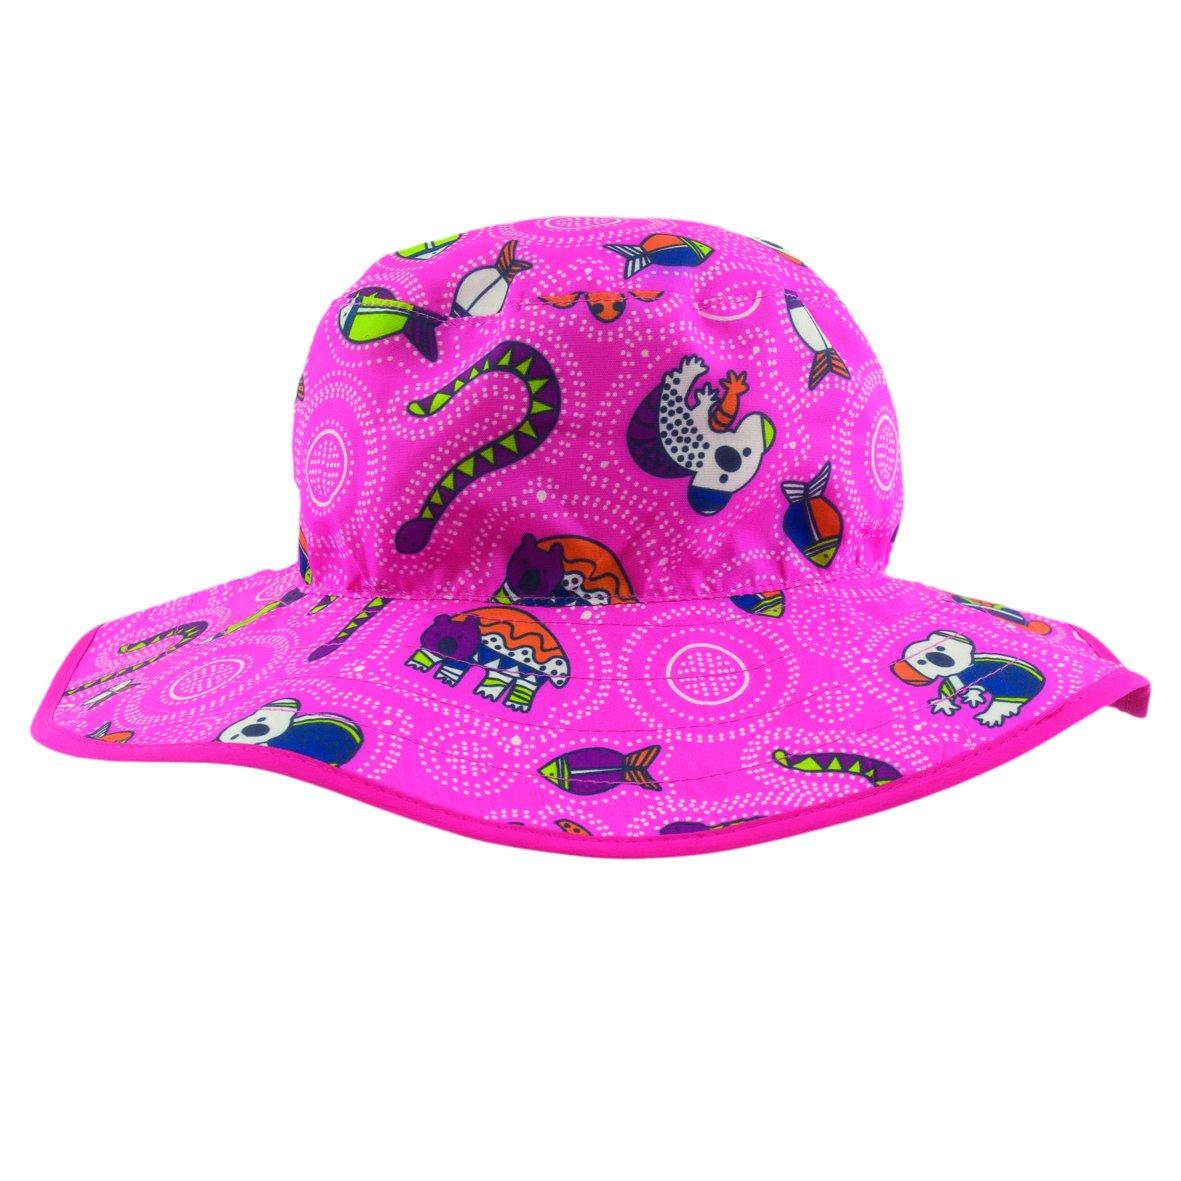 Banz KHRCGP 2015 Kids Reversible Hat, Coolgardie Pink Baby Banz 17442